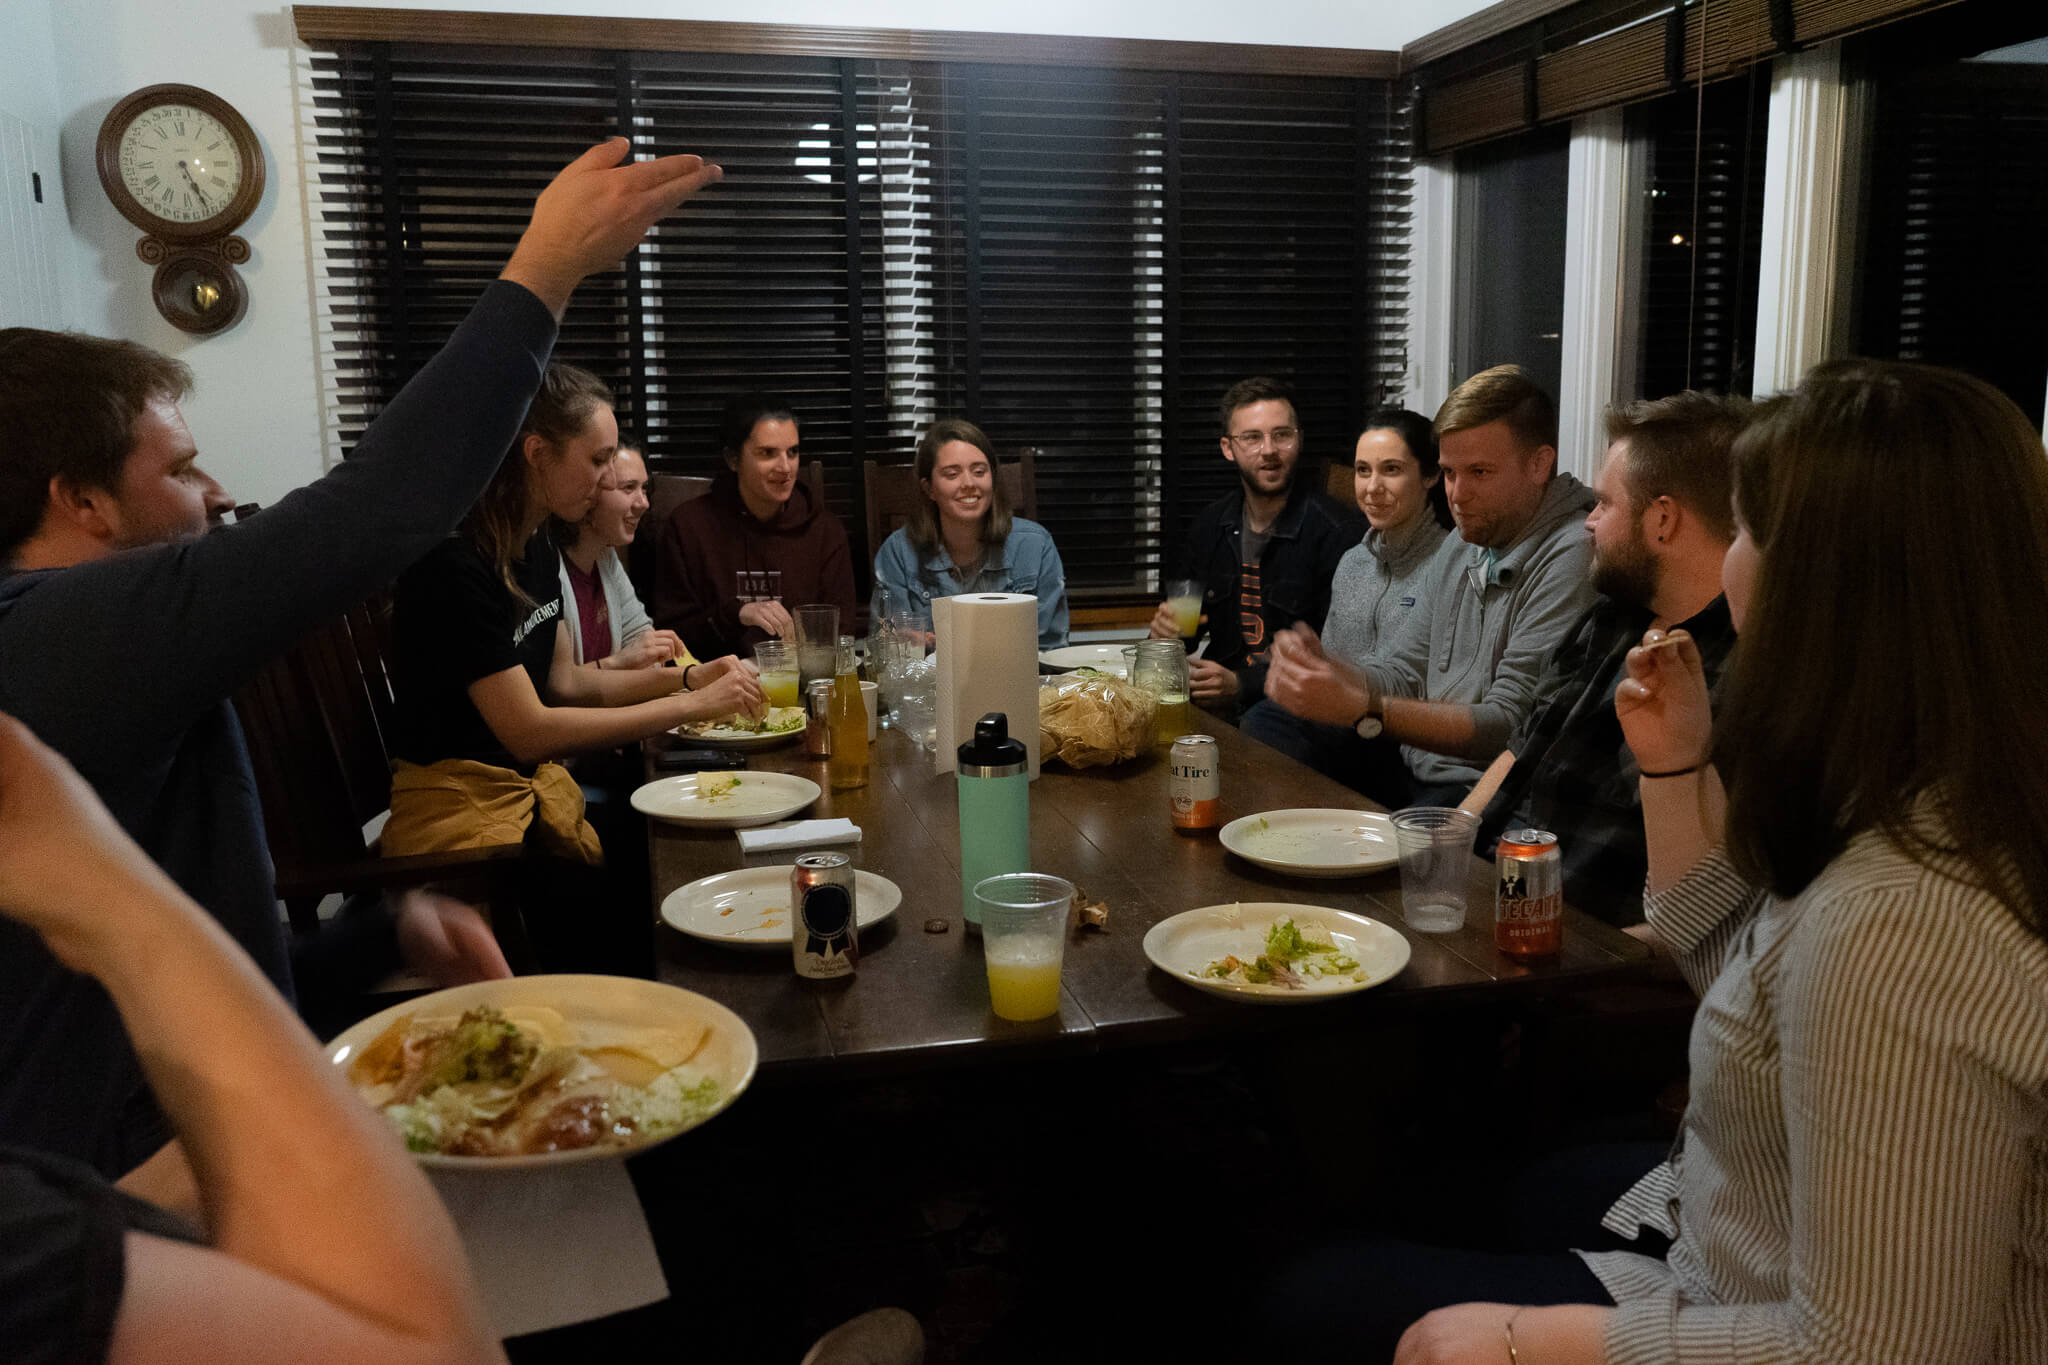 From left: Kevin Lawler, Dustin Mix, Helen Cramer, Kristen Titus, Maria Gibbs, Kathryn Keur, John Garry, Rachel Brandenberger, Brian Donoghue, Jon Keur, Anna Kennedy